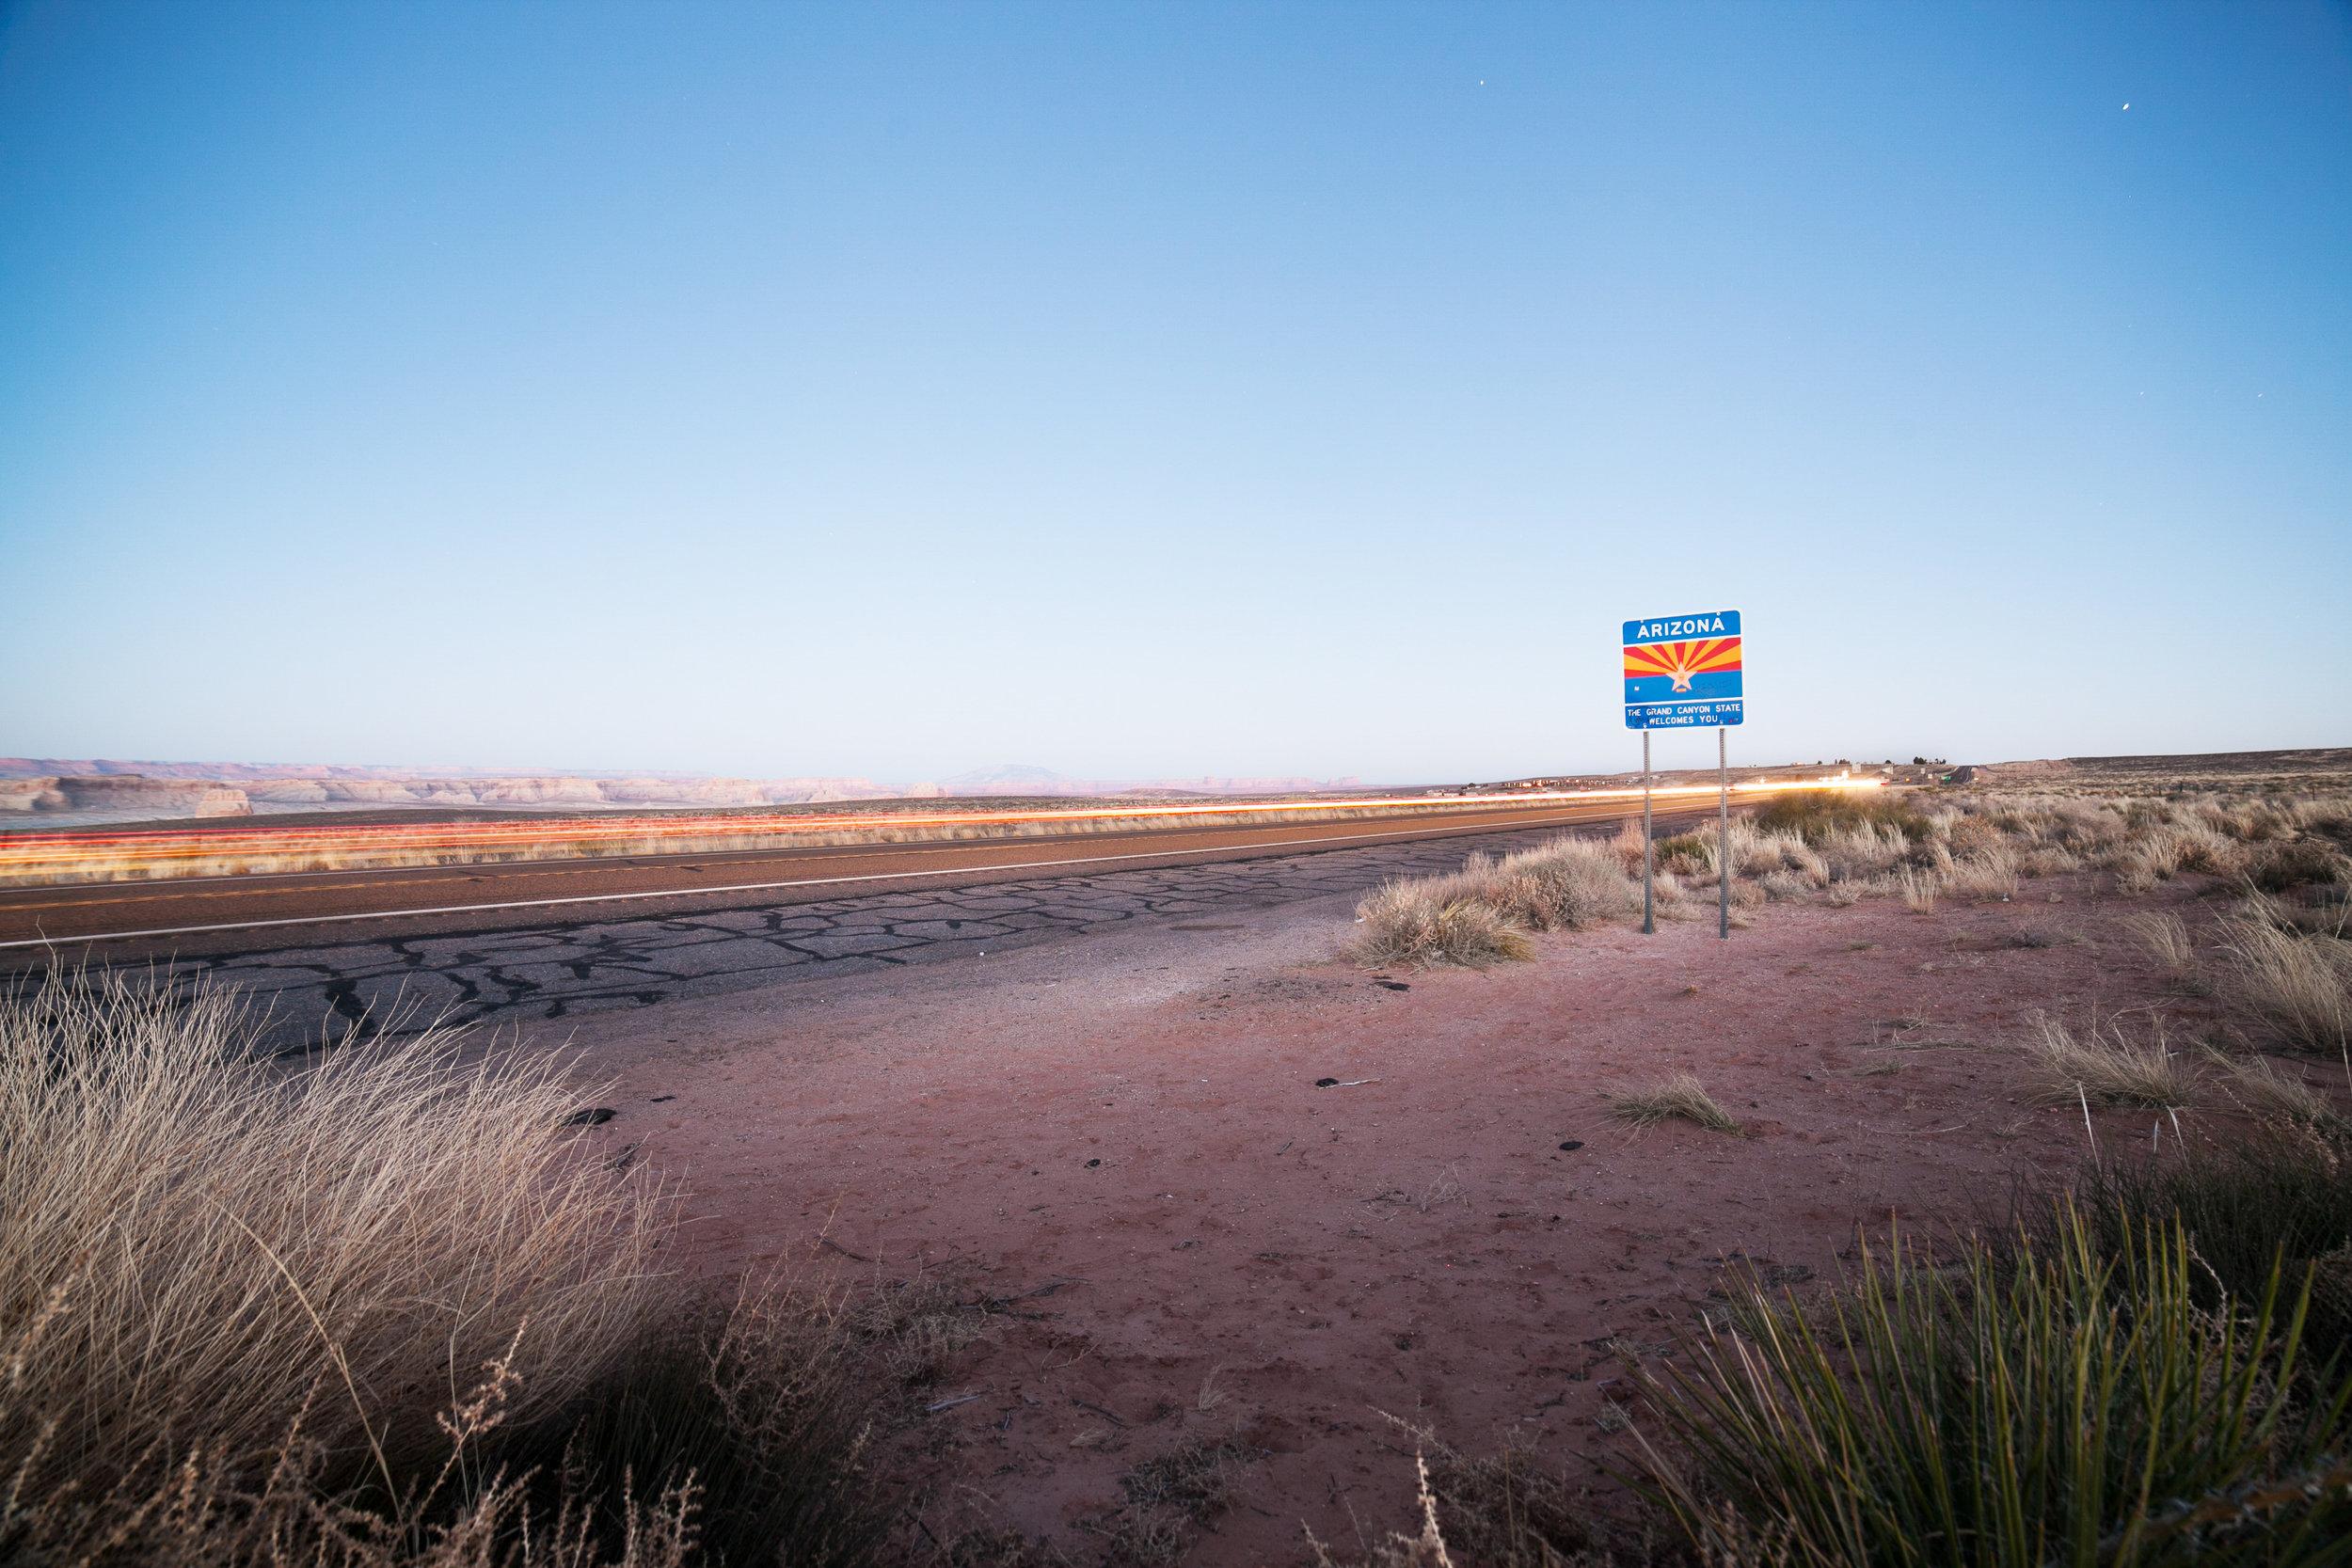 038Travel_Adventure_Photography_Outlive_Creative_Grand_Canyon_Arizona.jpg